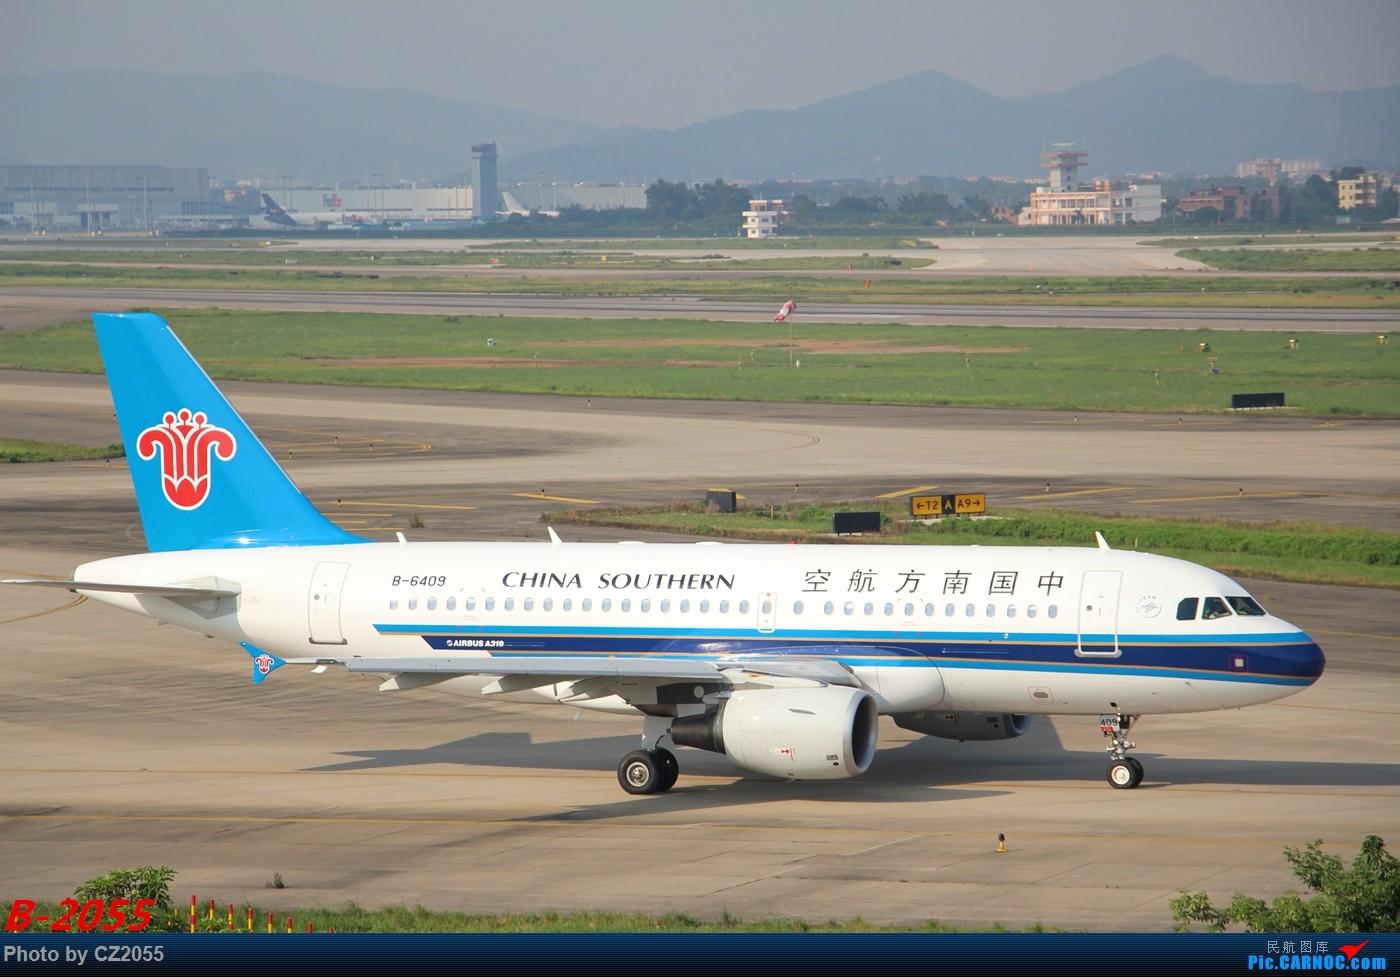 Re:[原创]Re:[原创]【广东青少年拍机小队】【C-Z-2055】发完737和宽体就升级320,那就再发一组320系列。 AIRBUS A319-100 B-6409 中国广州白云国际机场